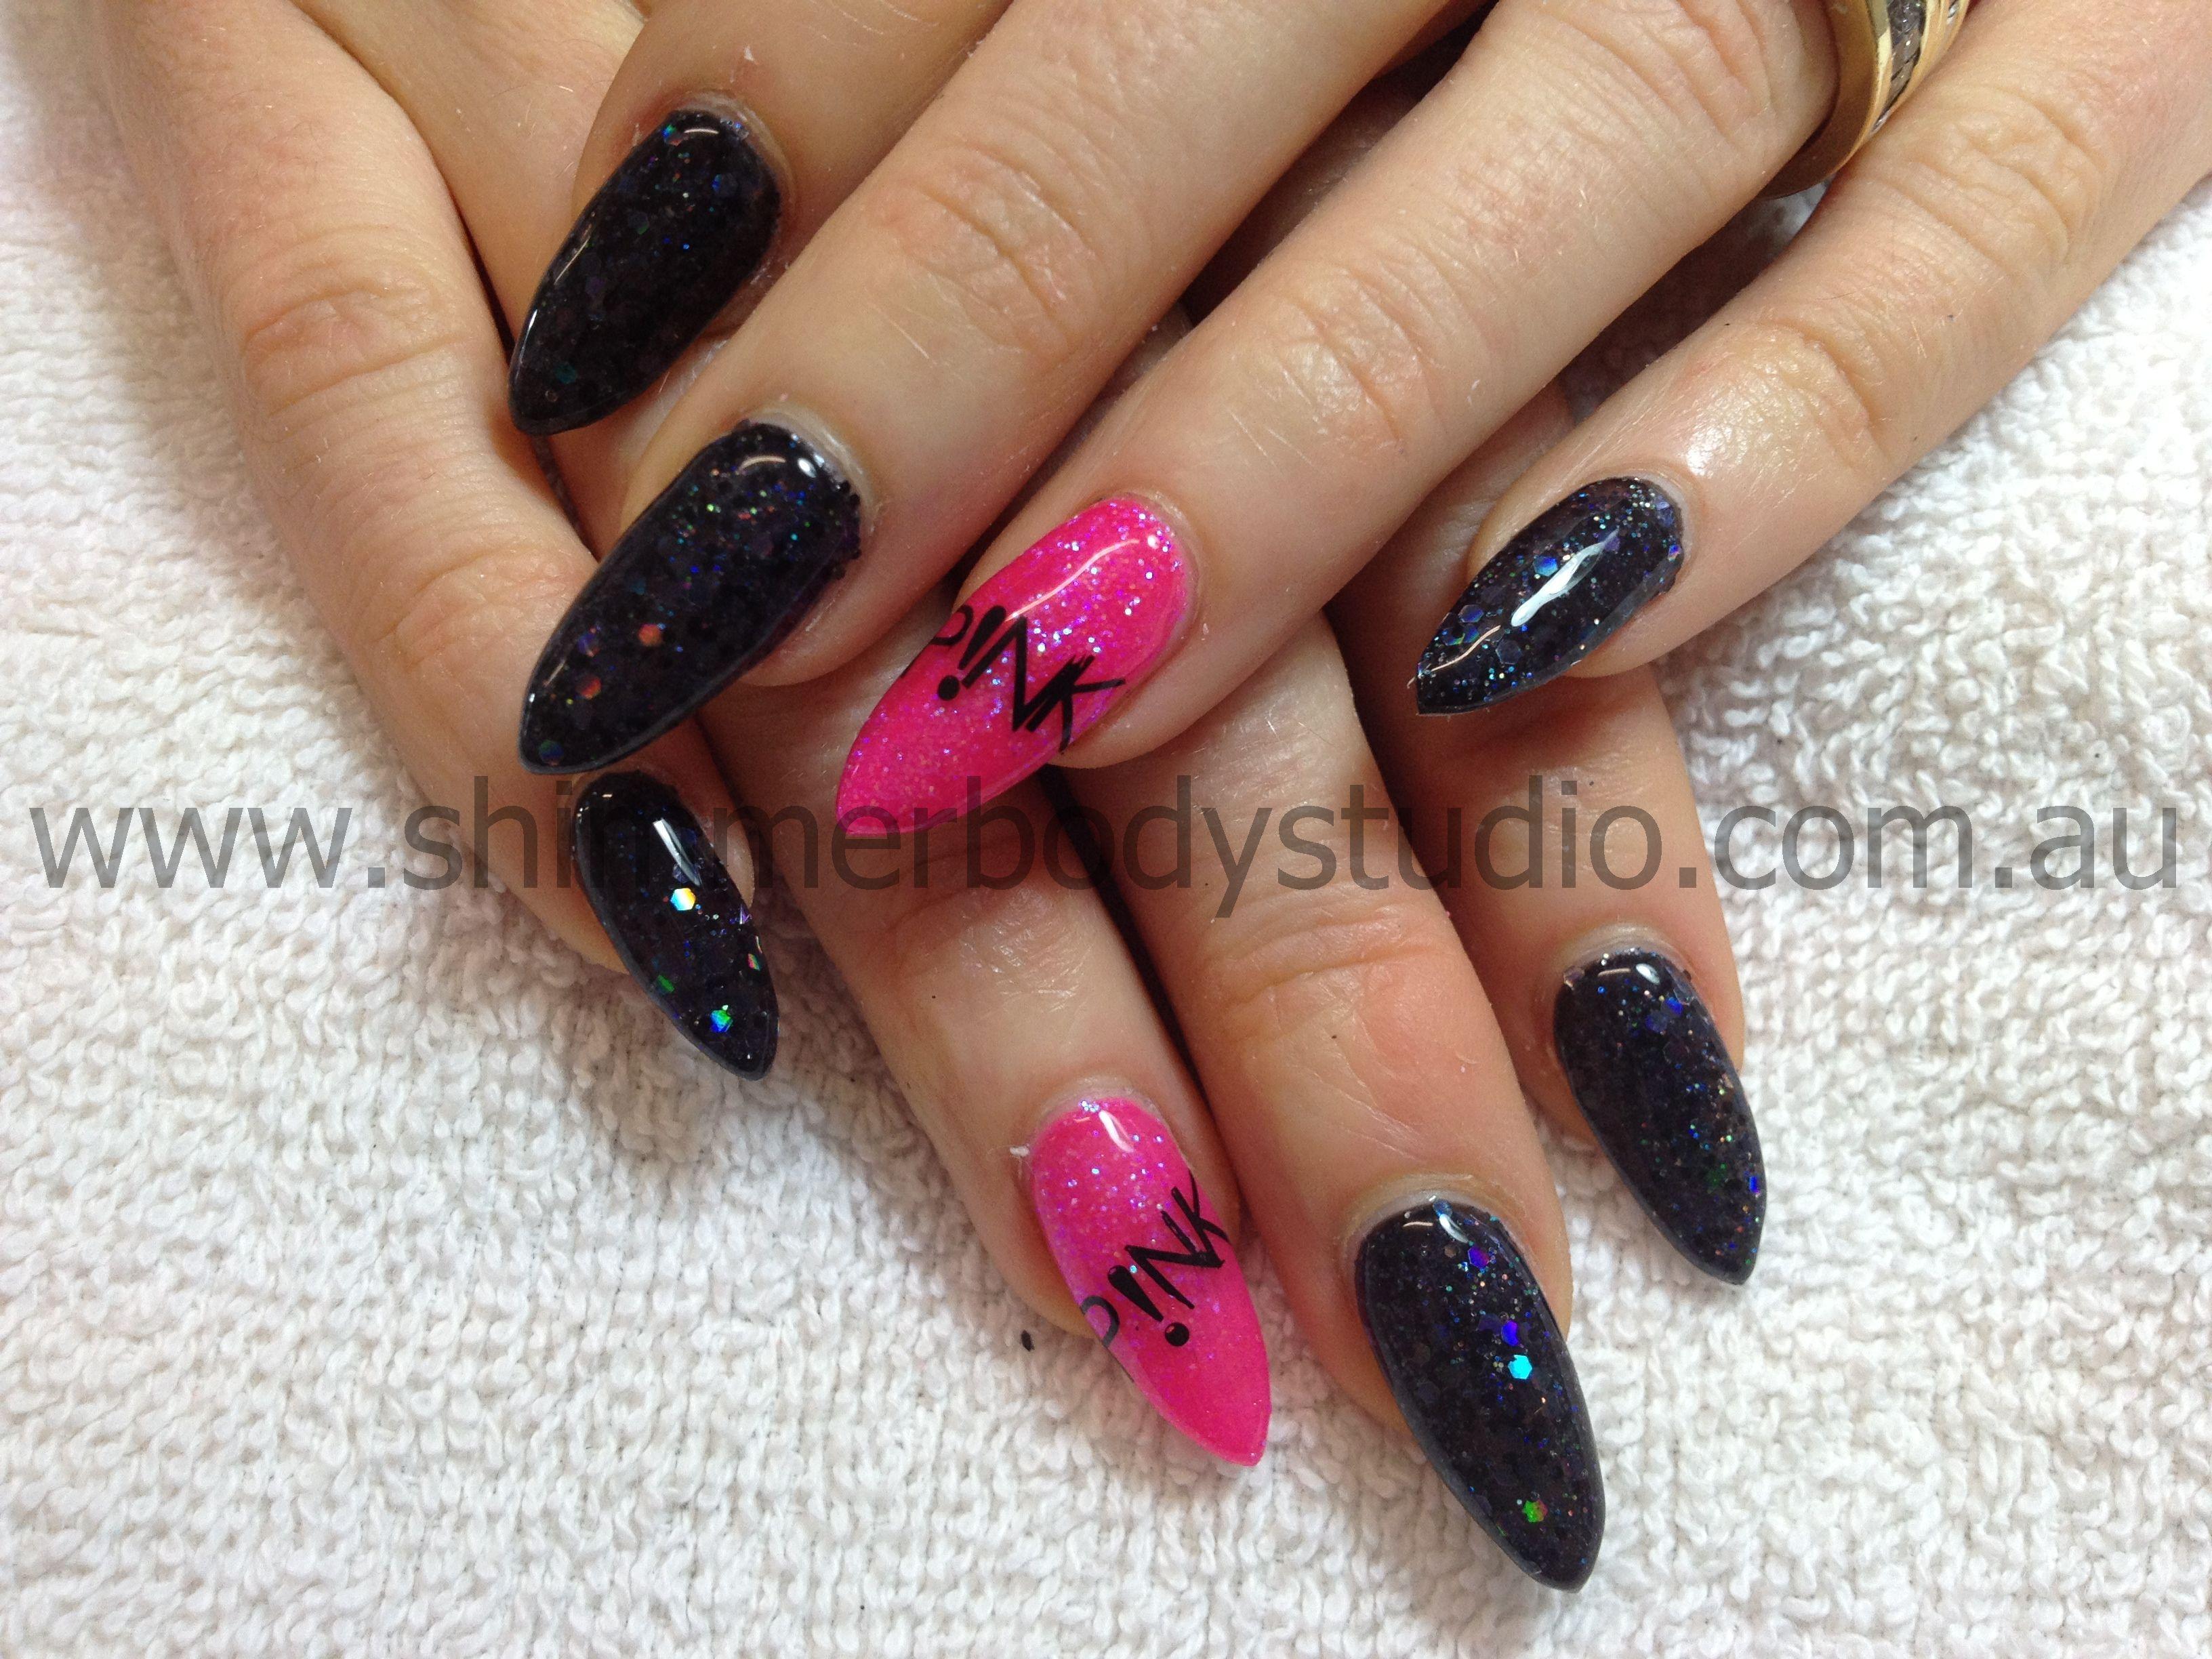 Gel nails, stilletto nails, glitter nails, black and pink nails ...